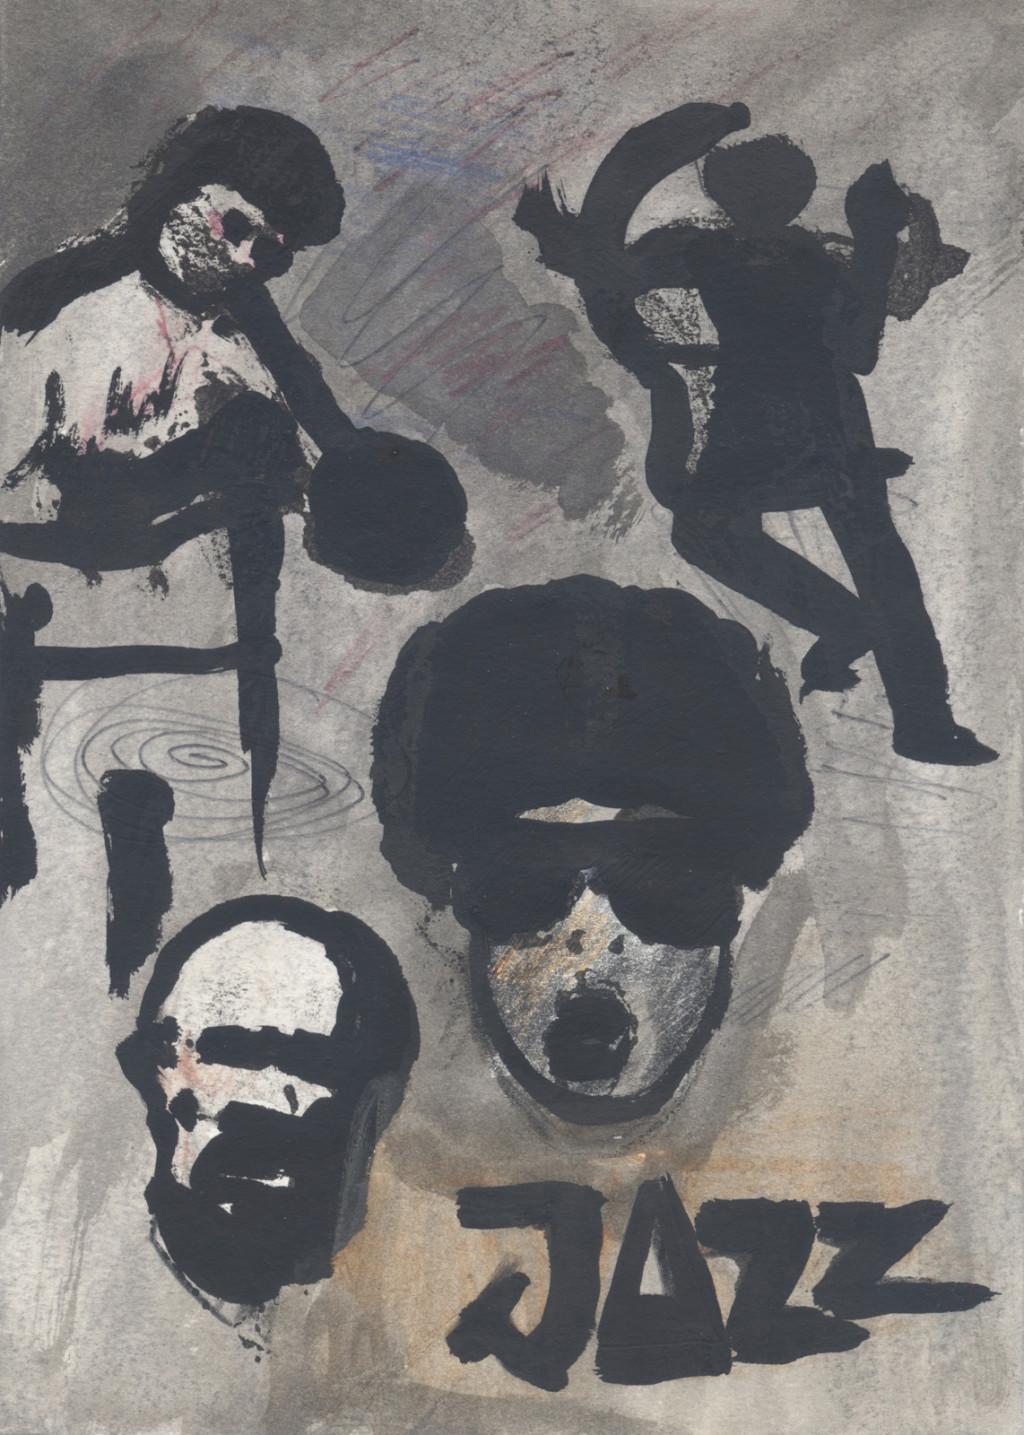 Ulrich Hakel Jazz